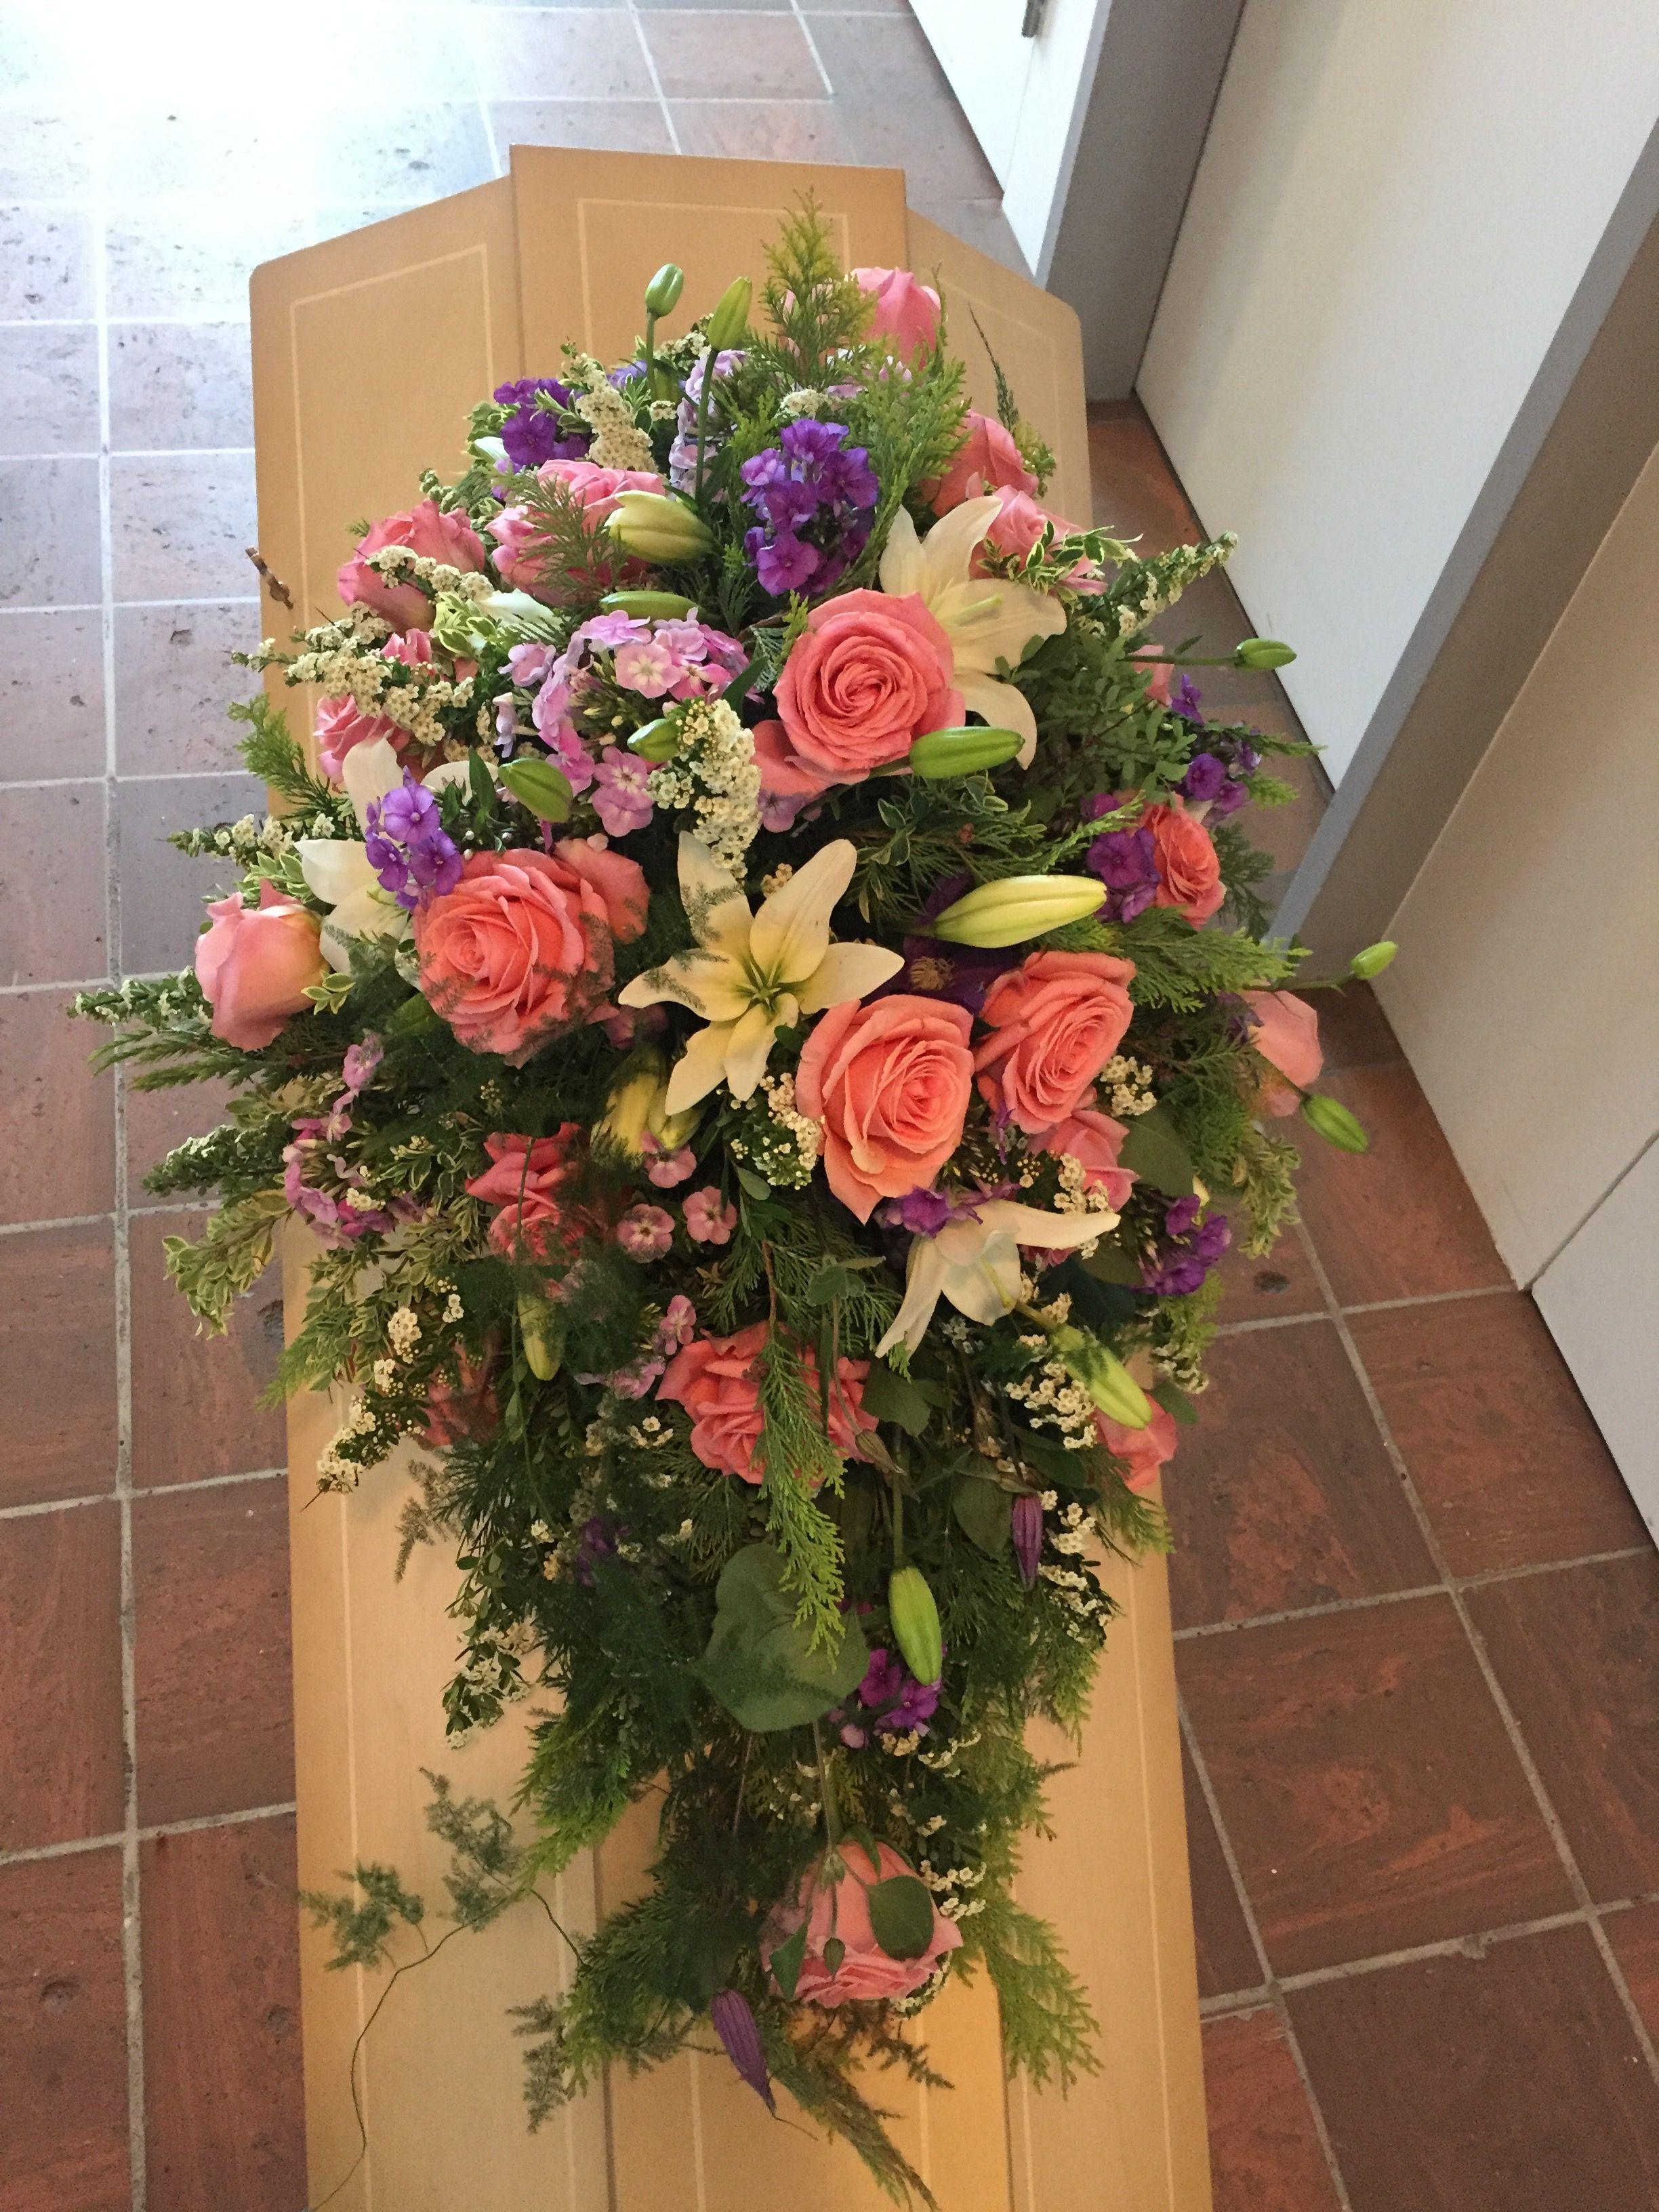 Pin By Popple River Primitives On Sargschmuck Casket Flowers Funeral Flower Arrangements Flower Arrangements